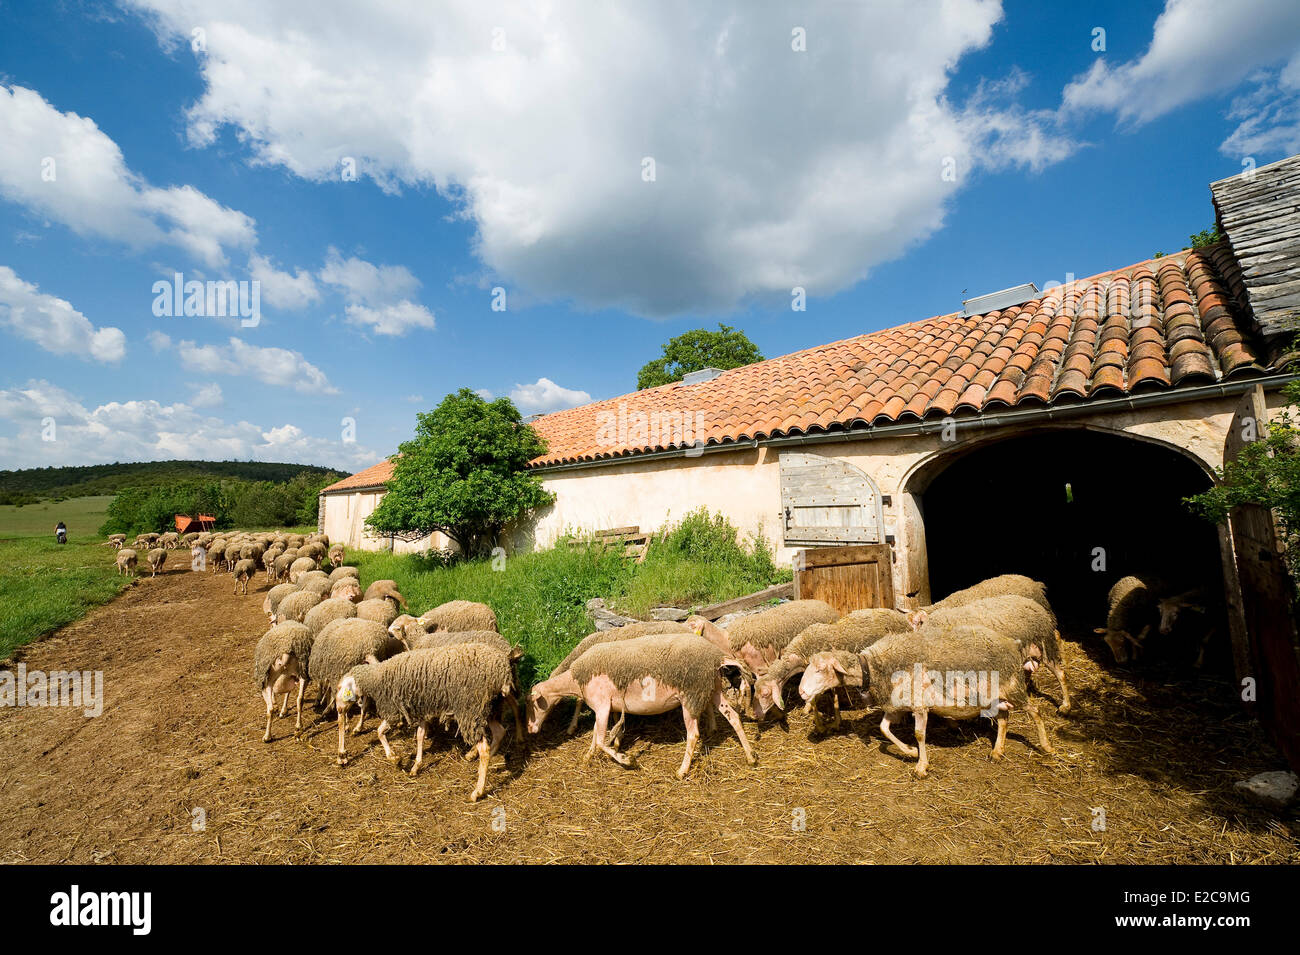 France, Aveyron, Saint Martin du Larzac, plateau of Larzac, sheep farm of Chantal Alvergnas and Thomas Lesay - Stock Image